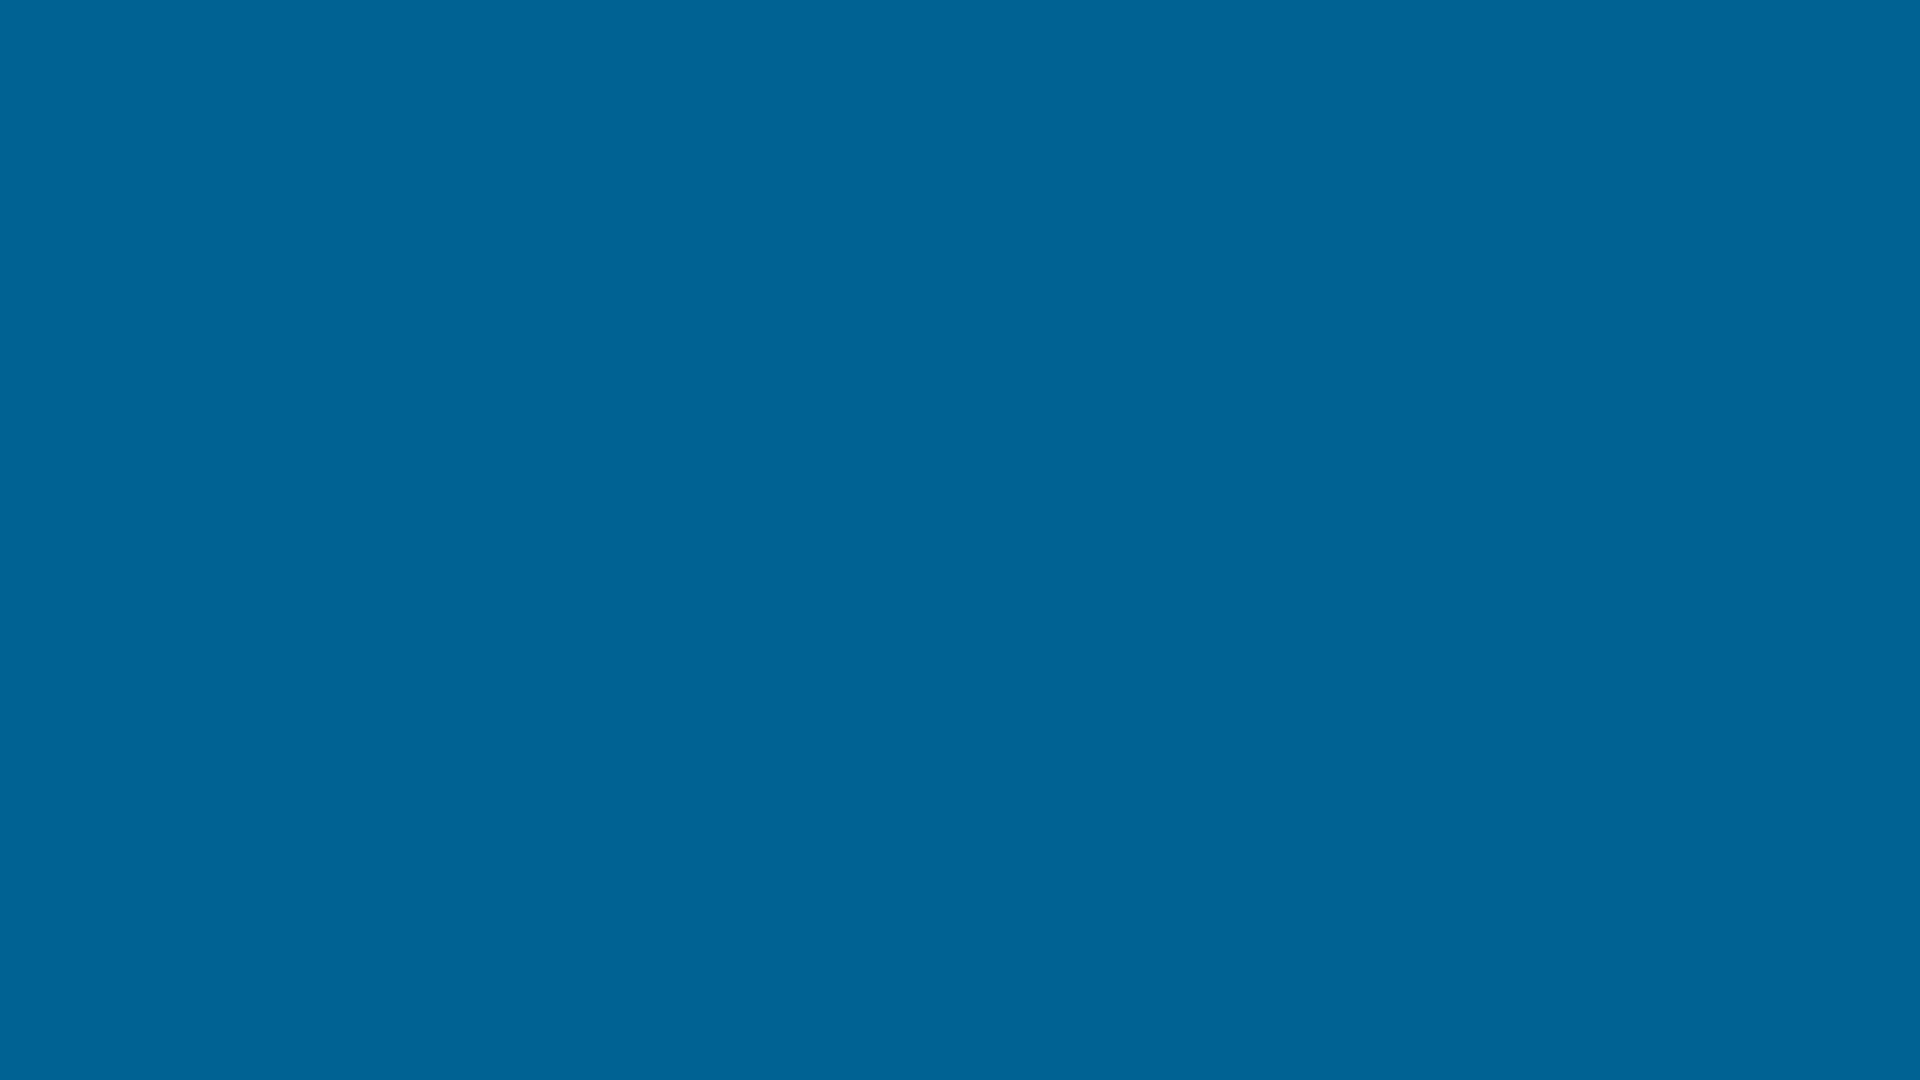 blu-4